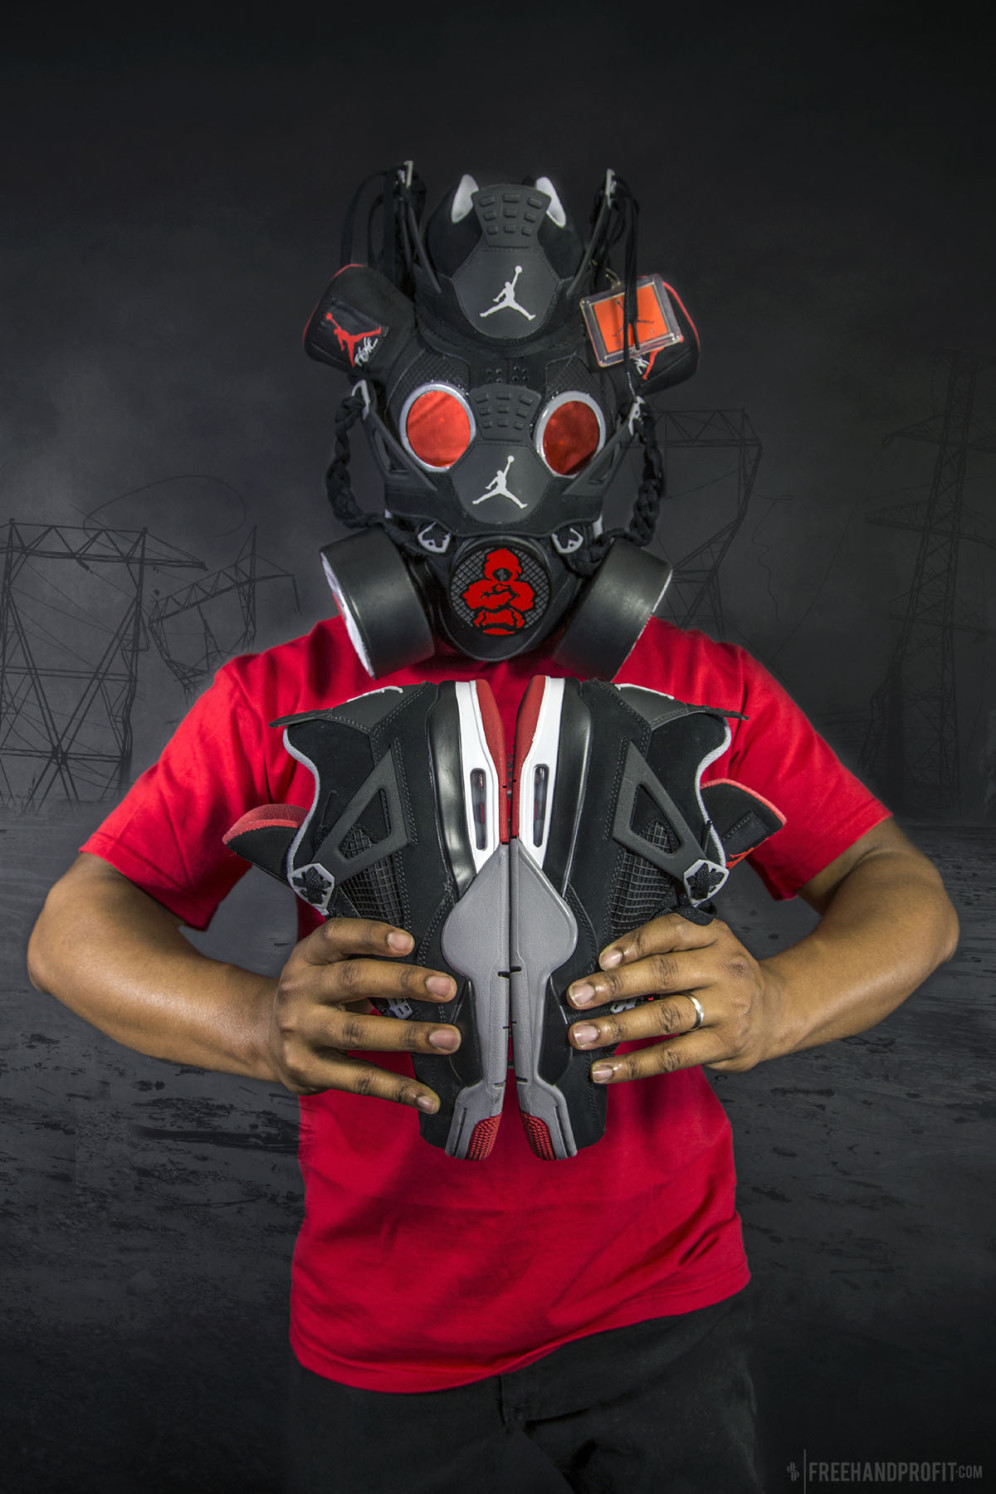 buy online 8304e 92946 Jordan «Black Cement» IV Gas Mask by Freehand Profit